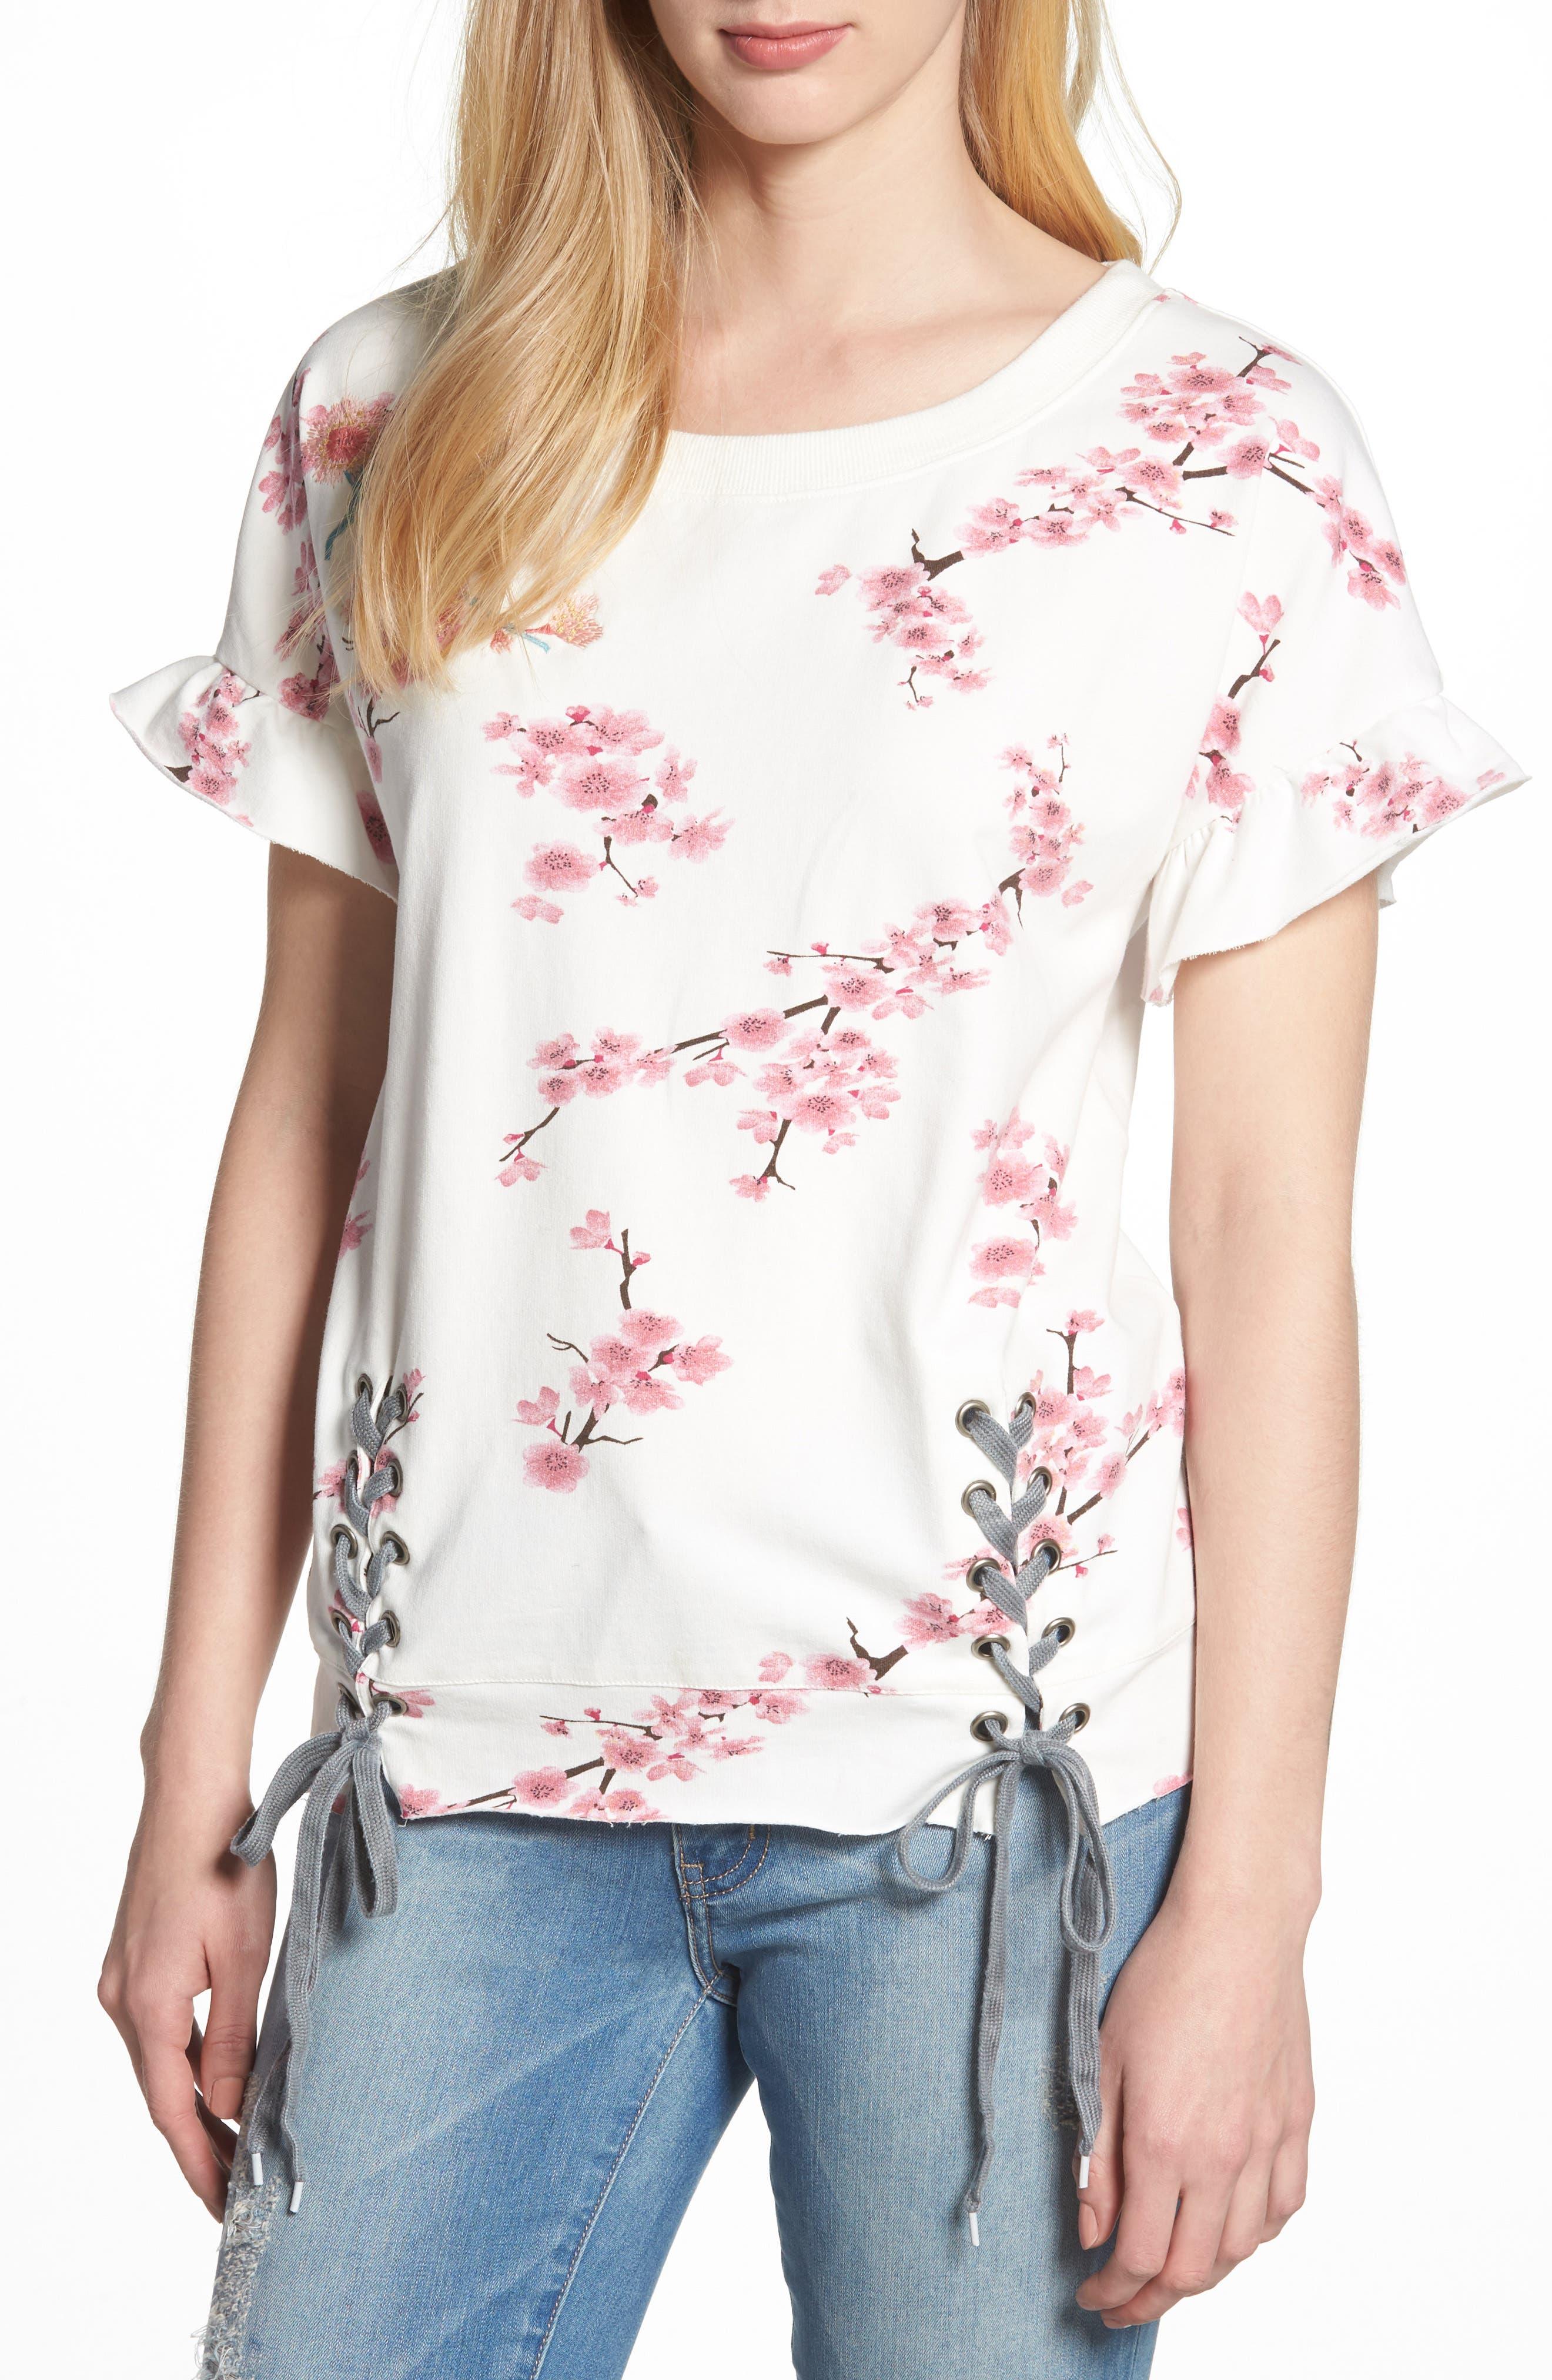 Cherry Blossom Short Sleeve Lace-Up Sweatshirt,                             Main thumbnail 1, color,                             WHITE CHERRY BLOSSOM